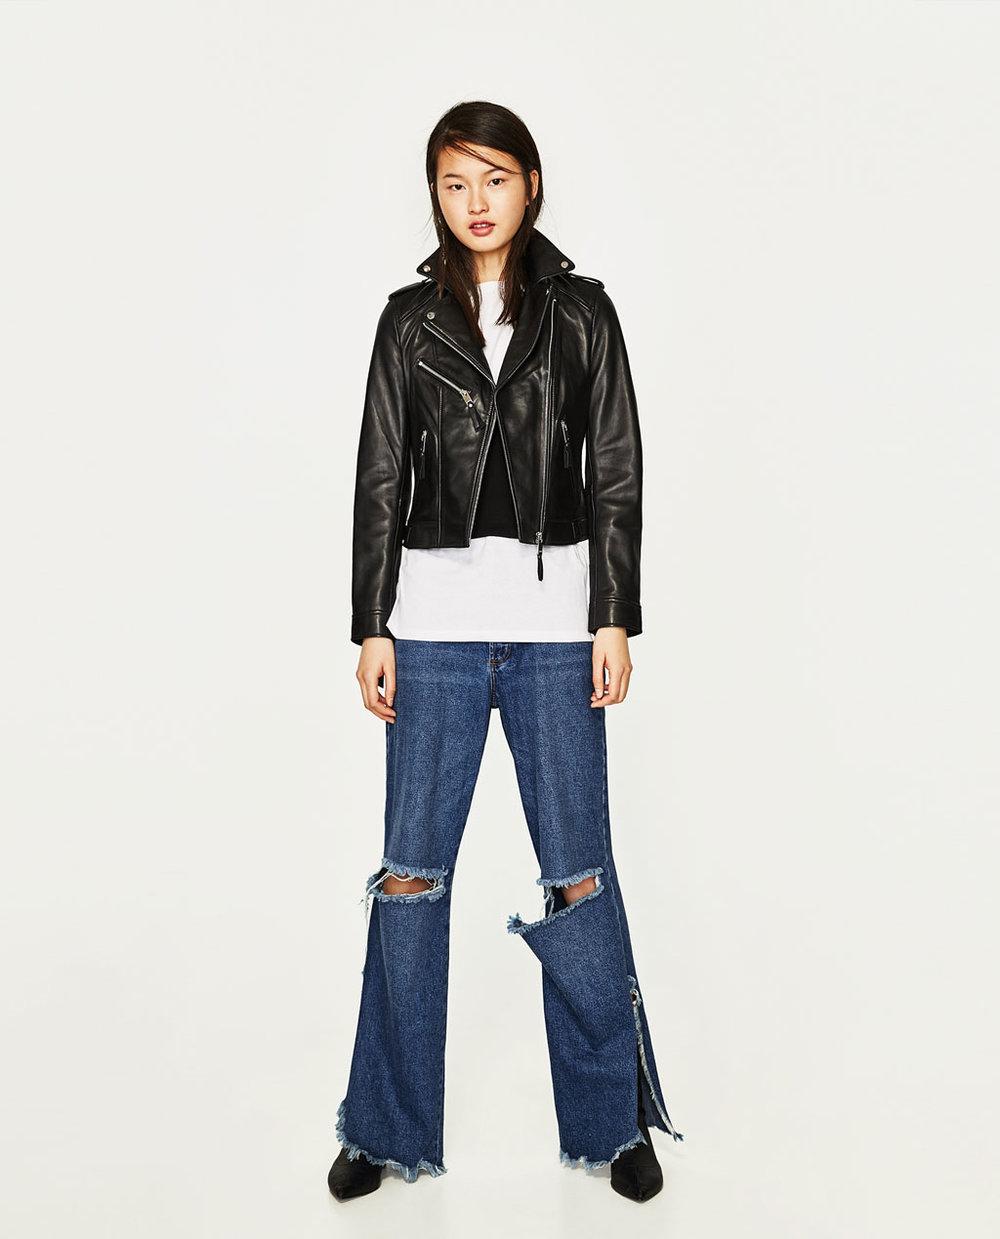 Zara Biker Style Jacket